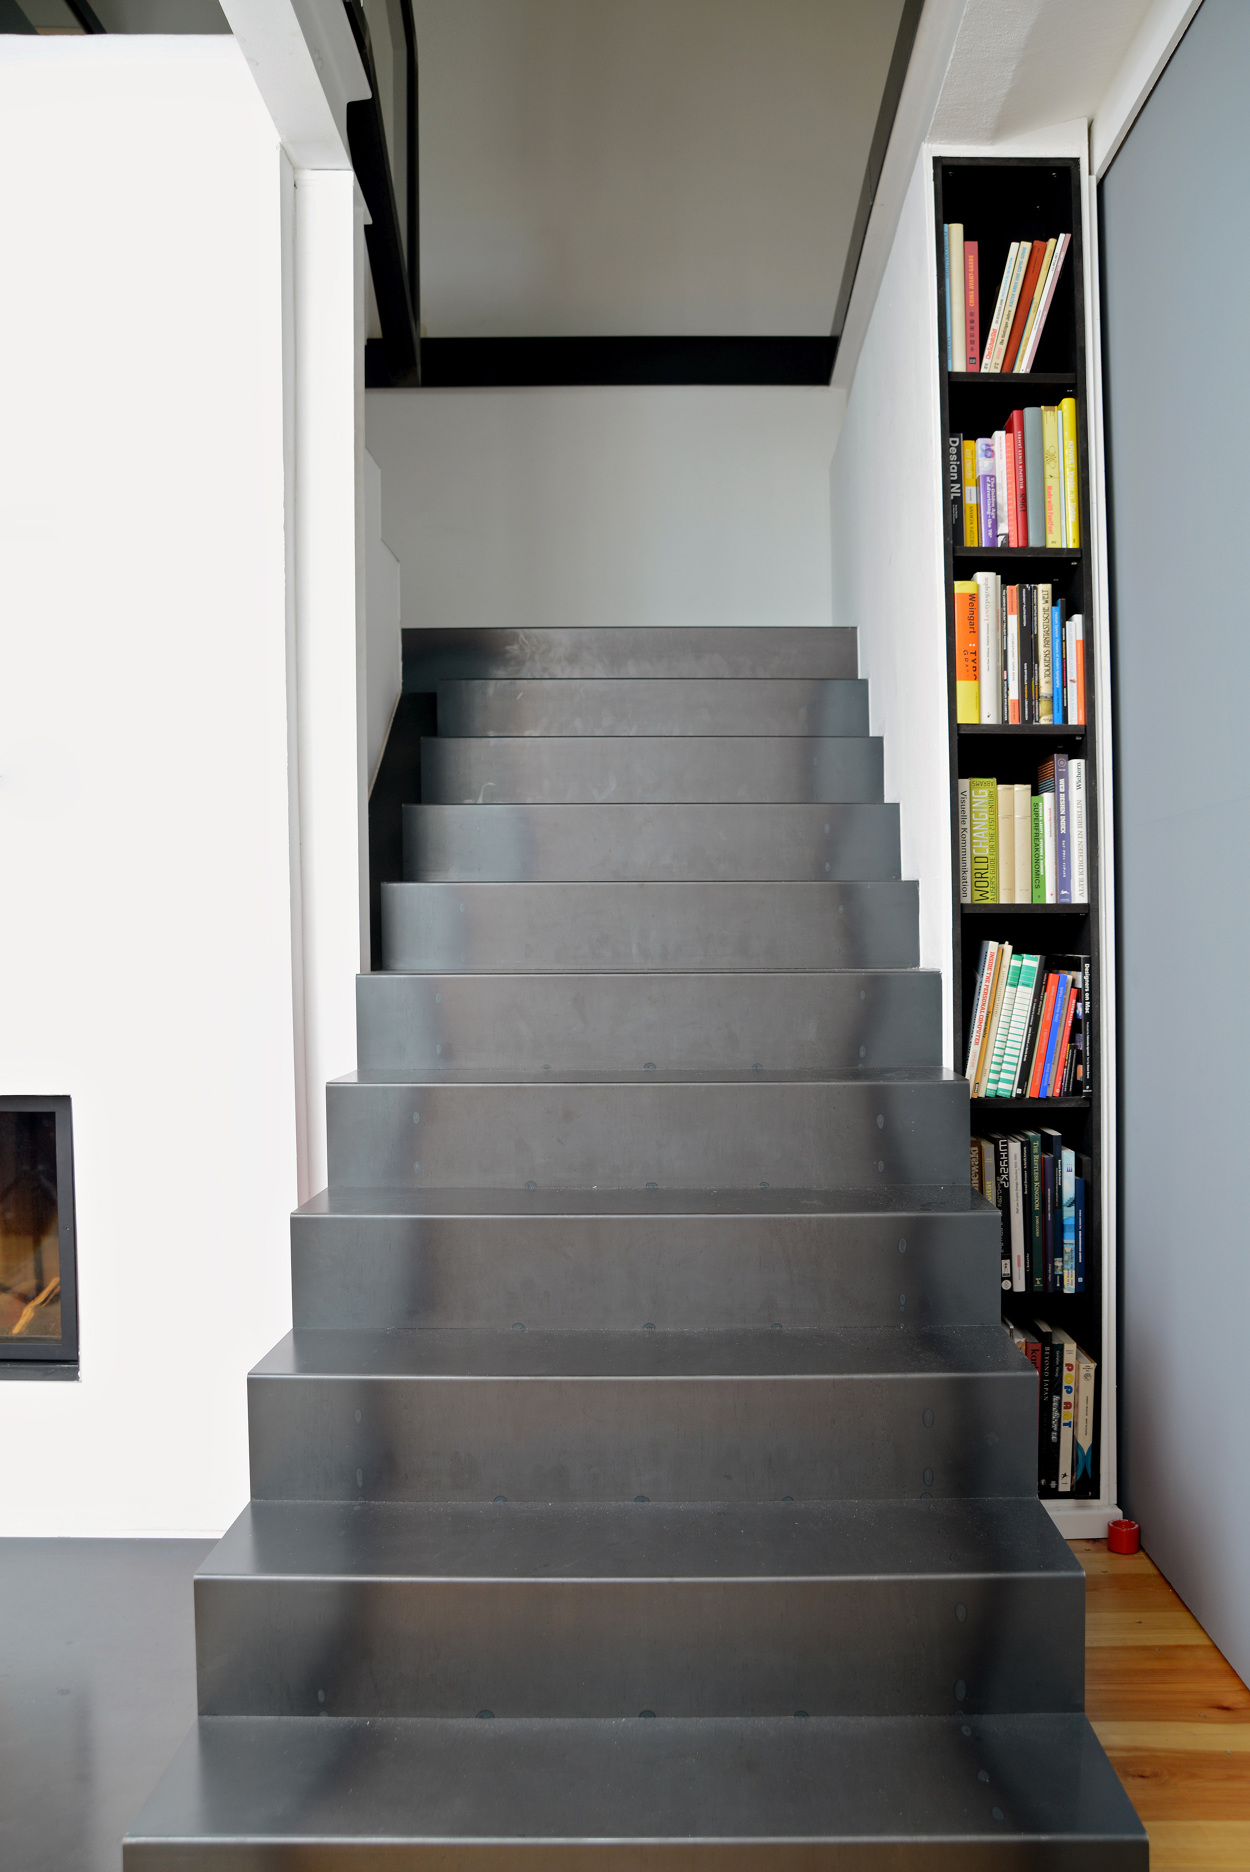 neulant van exel loft friedrichshain neulant van exel. Black Bedroom Furniture Sets. Home Design Ideas